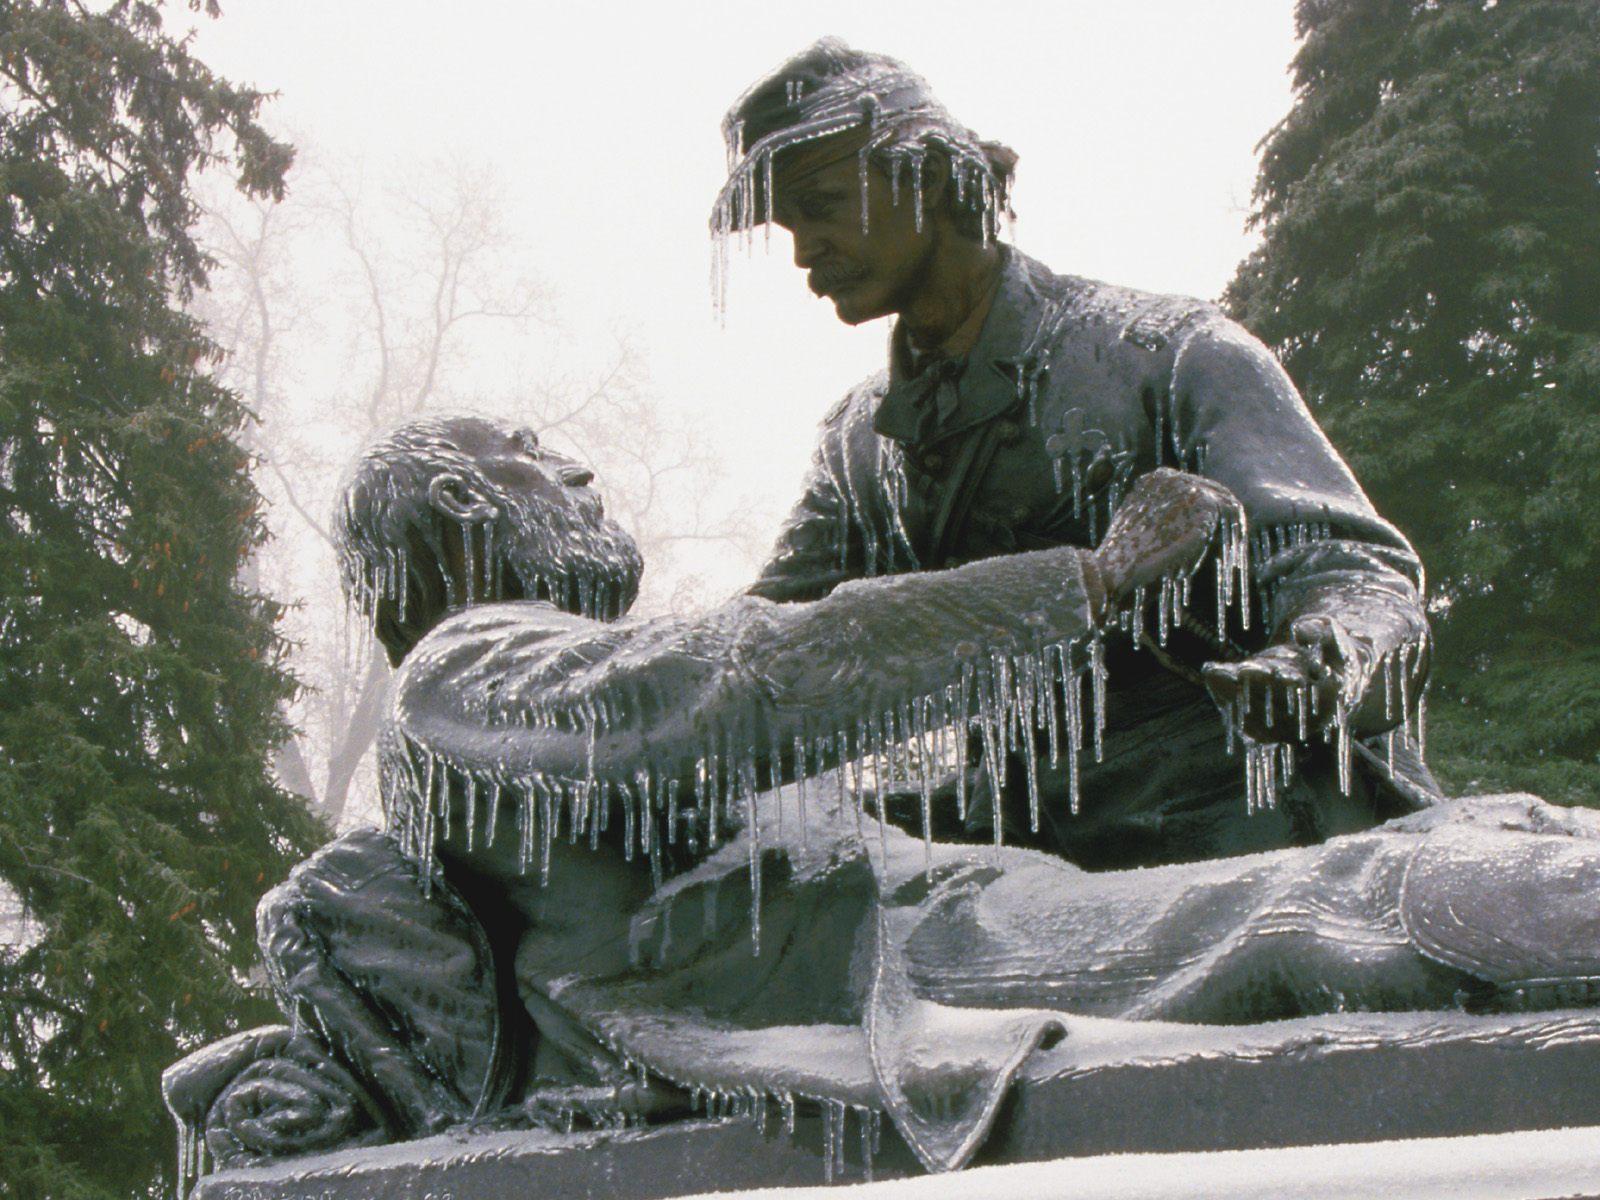 Friend To Friend Monument Gettysburg National Military Park Pennsylvania